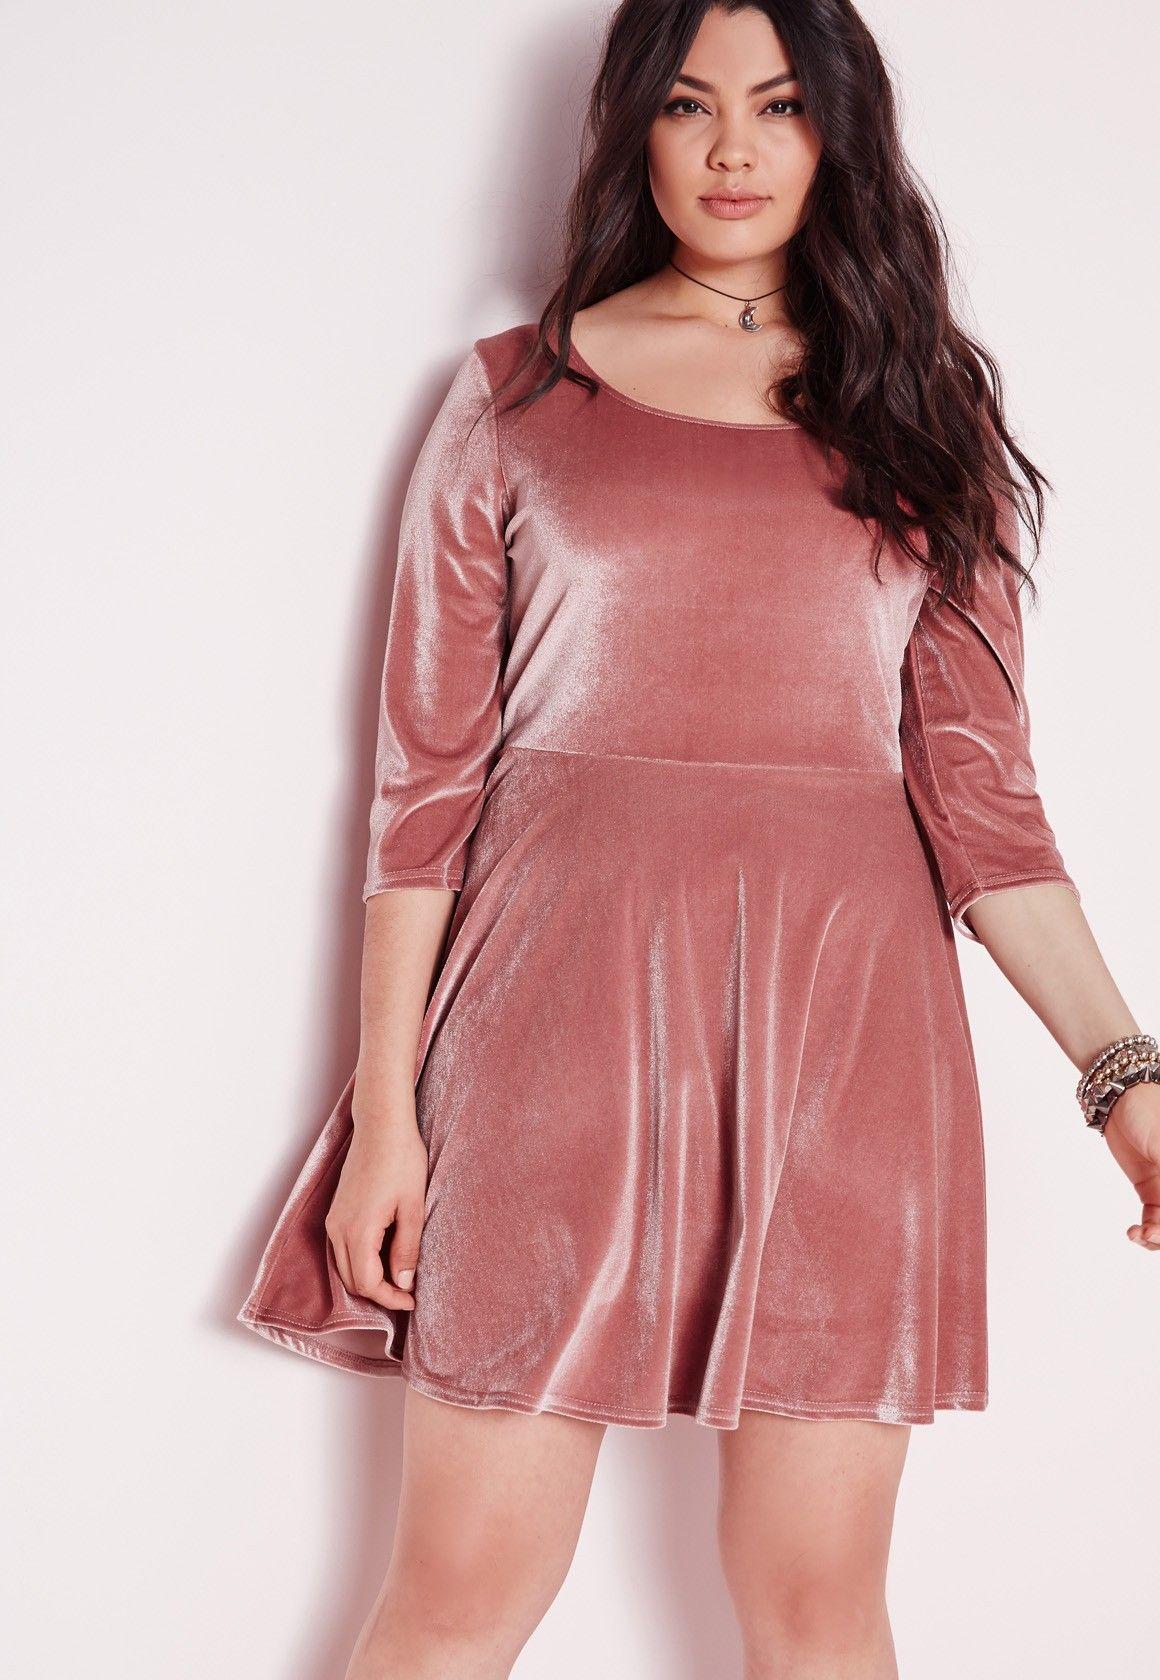 Missguided - Plus Size Velvet Skater Dress Pink | My Style ...